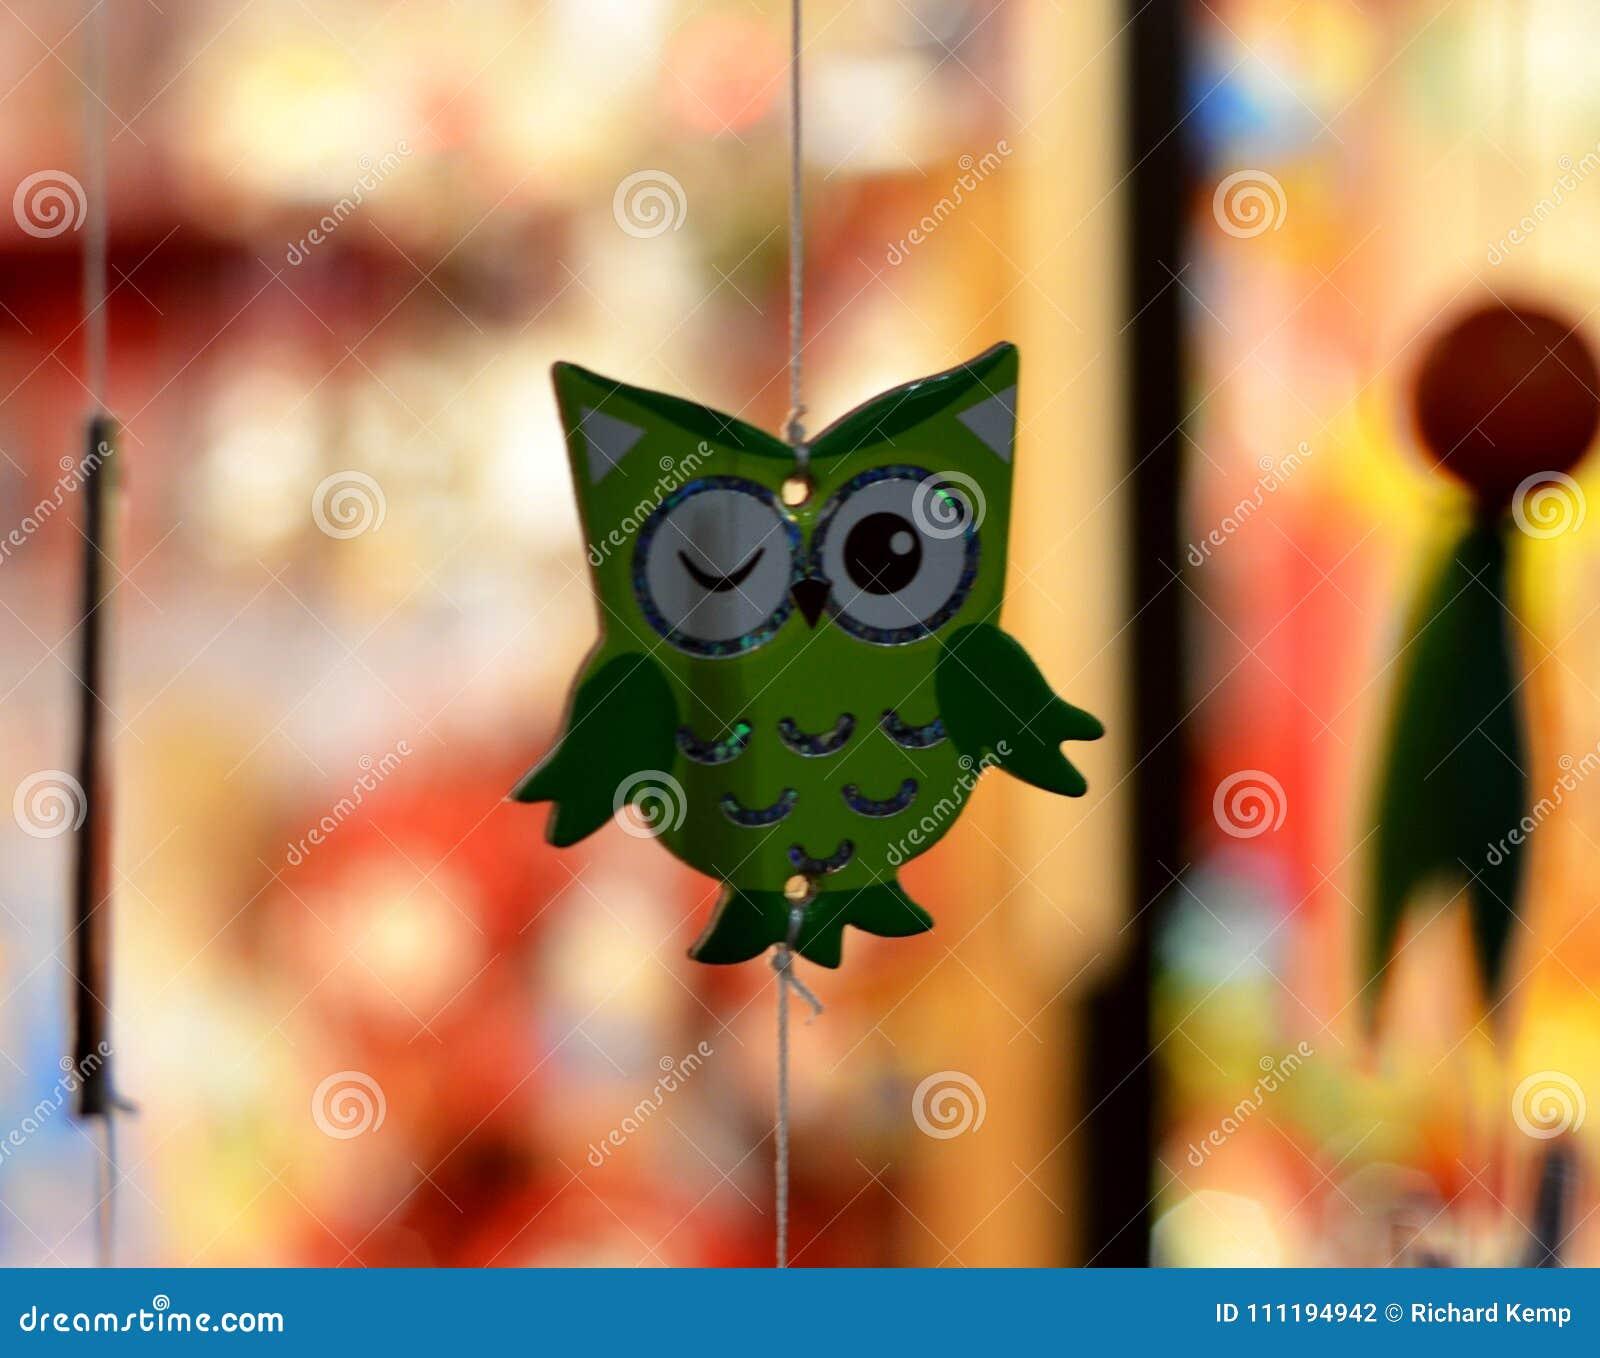 Hibou clignotant vert